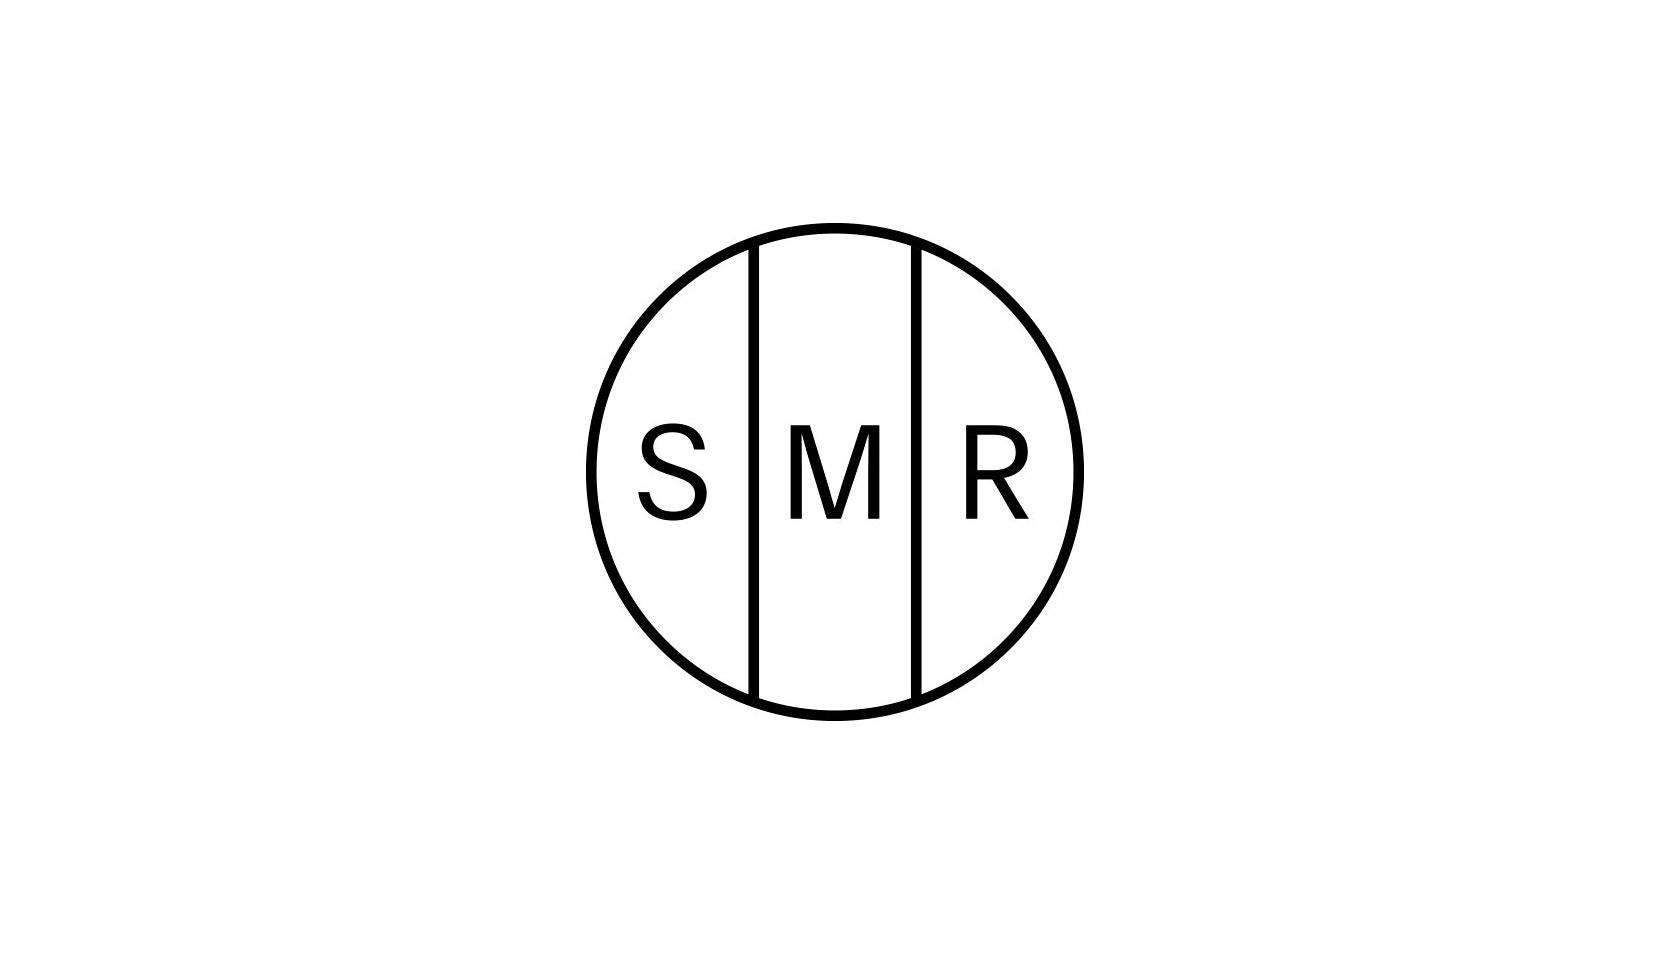 Geometric circular logo